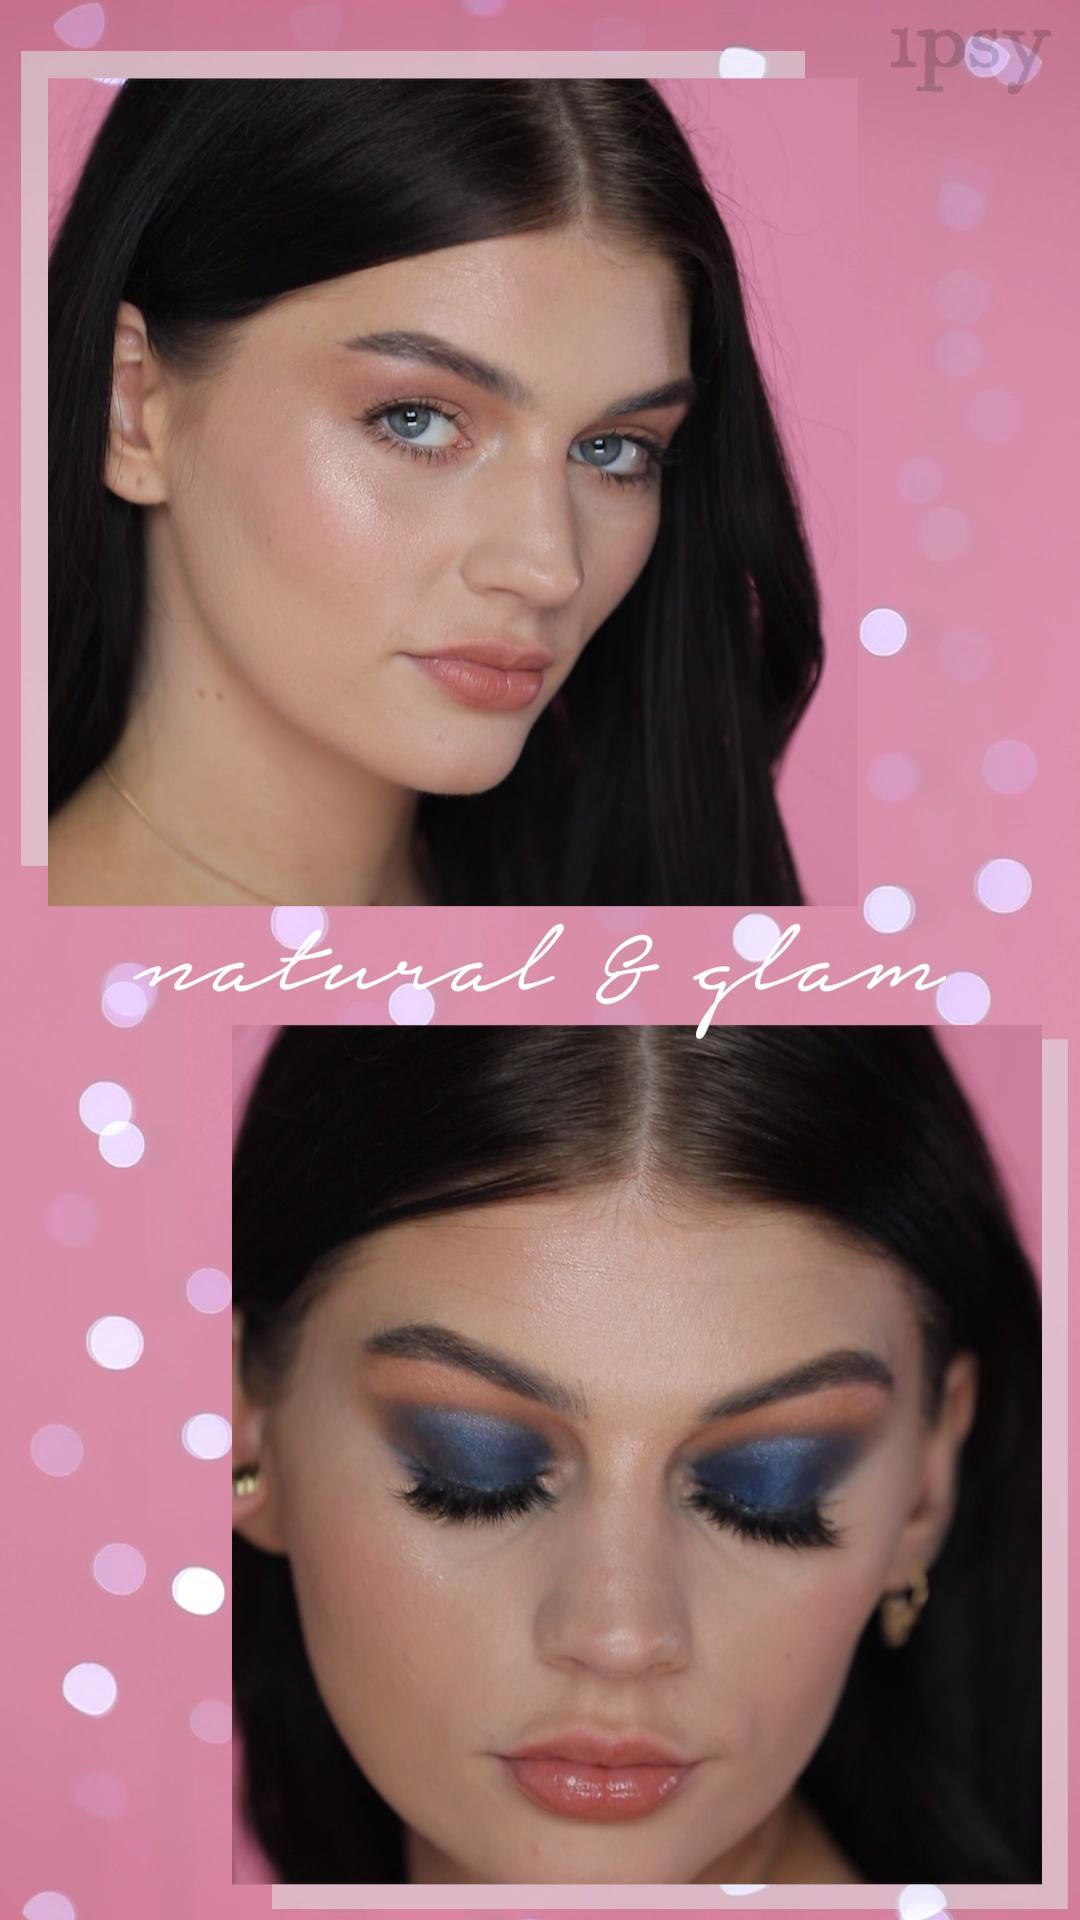 2 Shimmery Holiday Makeup Tutorials: Glam & Natural | ipsy U -   22 beauty Videos salon ideas